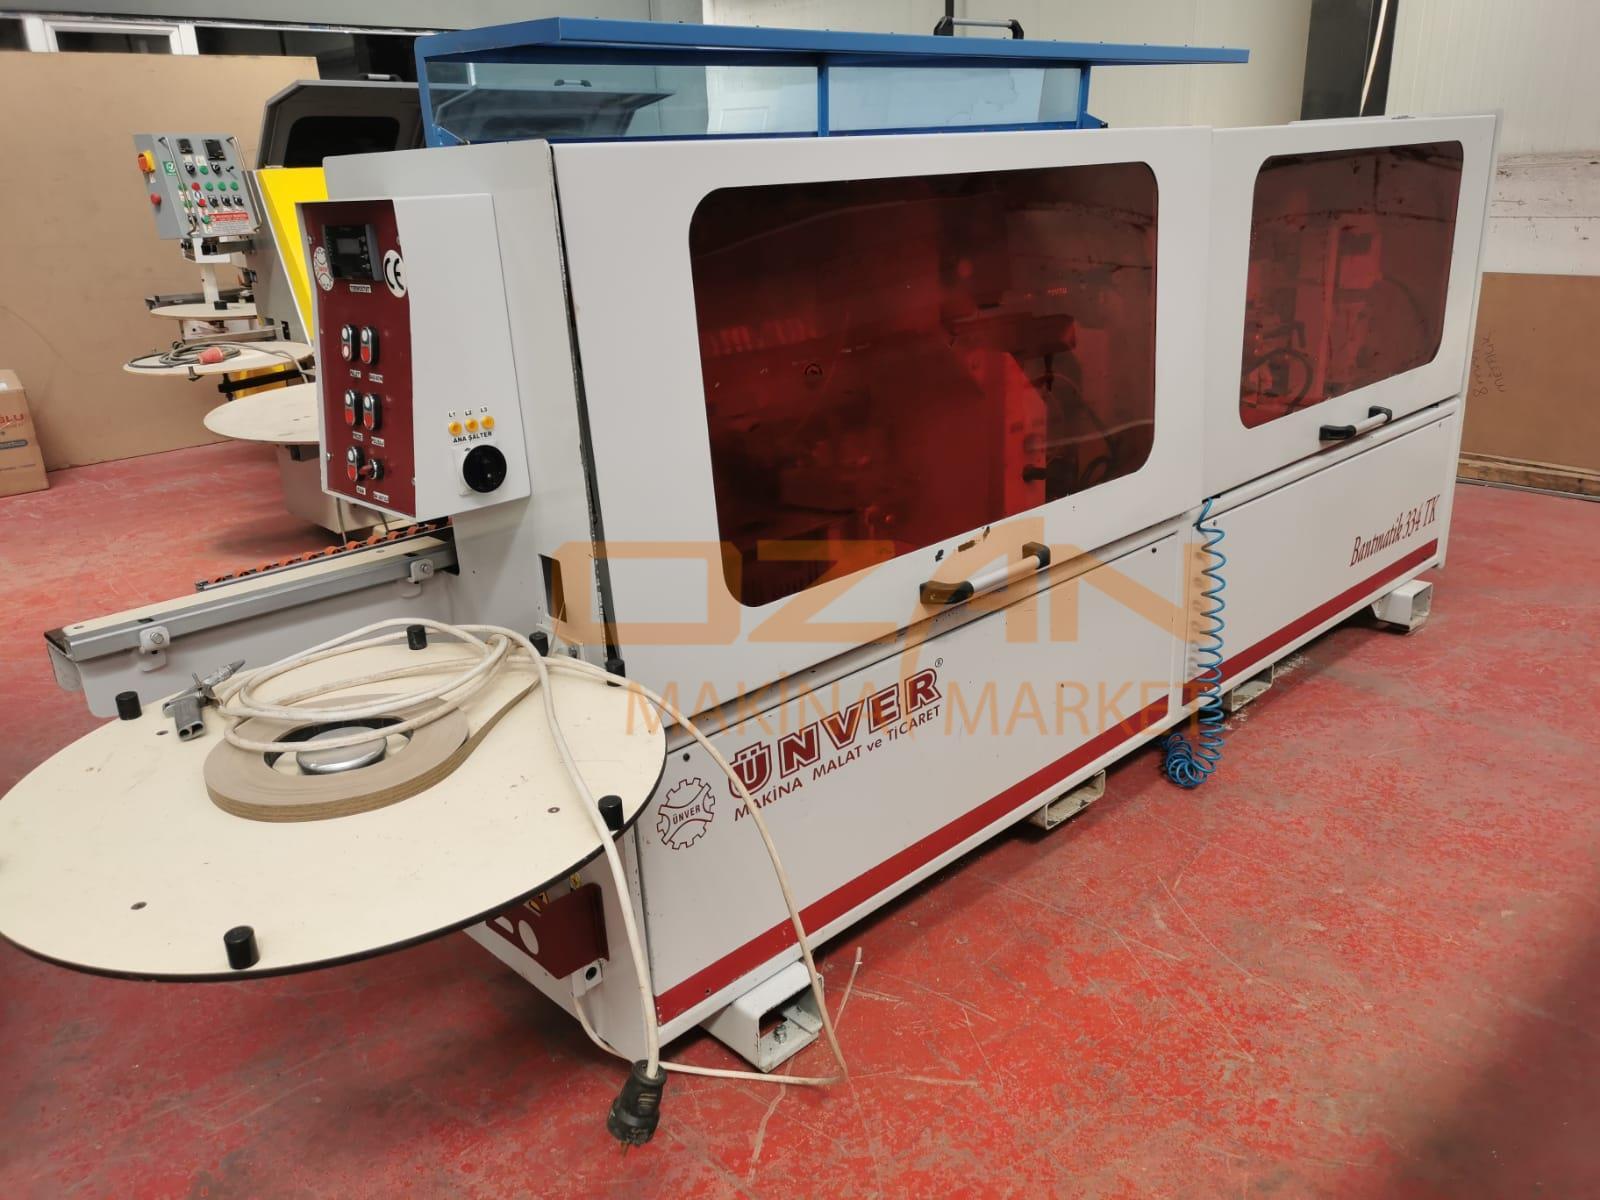 ÜNVER BTK 437 HEAD-END CUTTING MILLED SIDE BANDING MACHINE